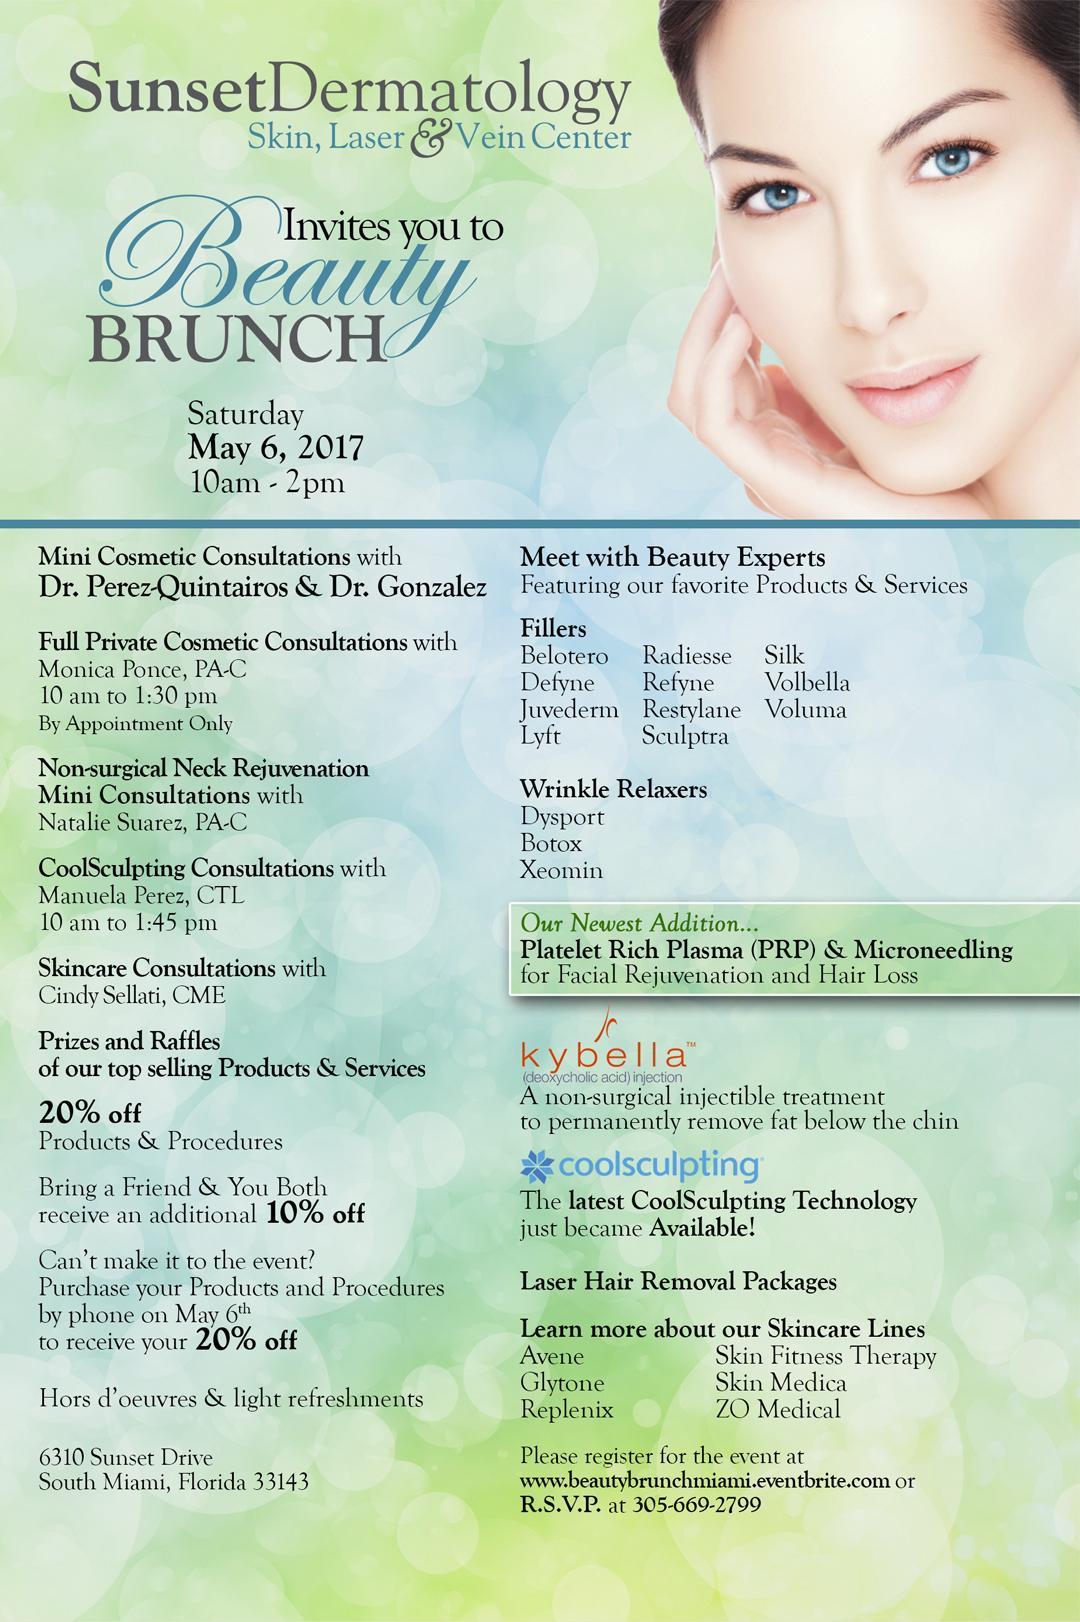 Beauty Brunch South Miami, Sunset Dermatology